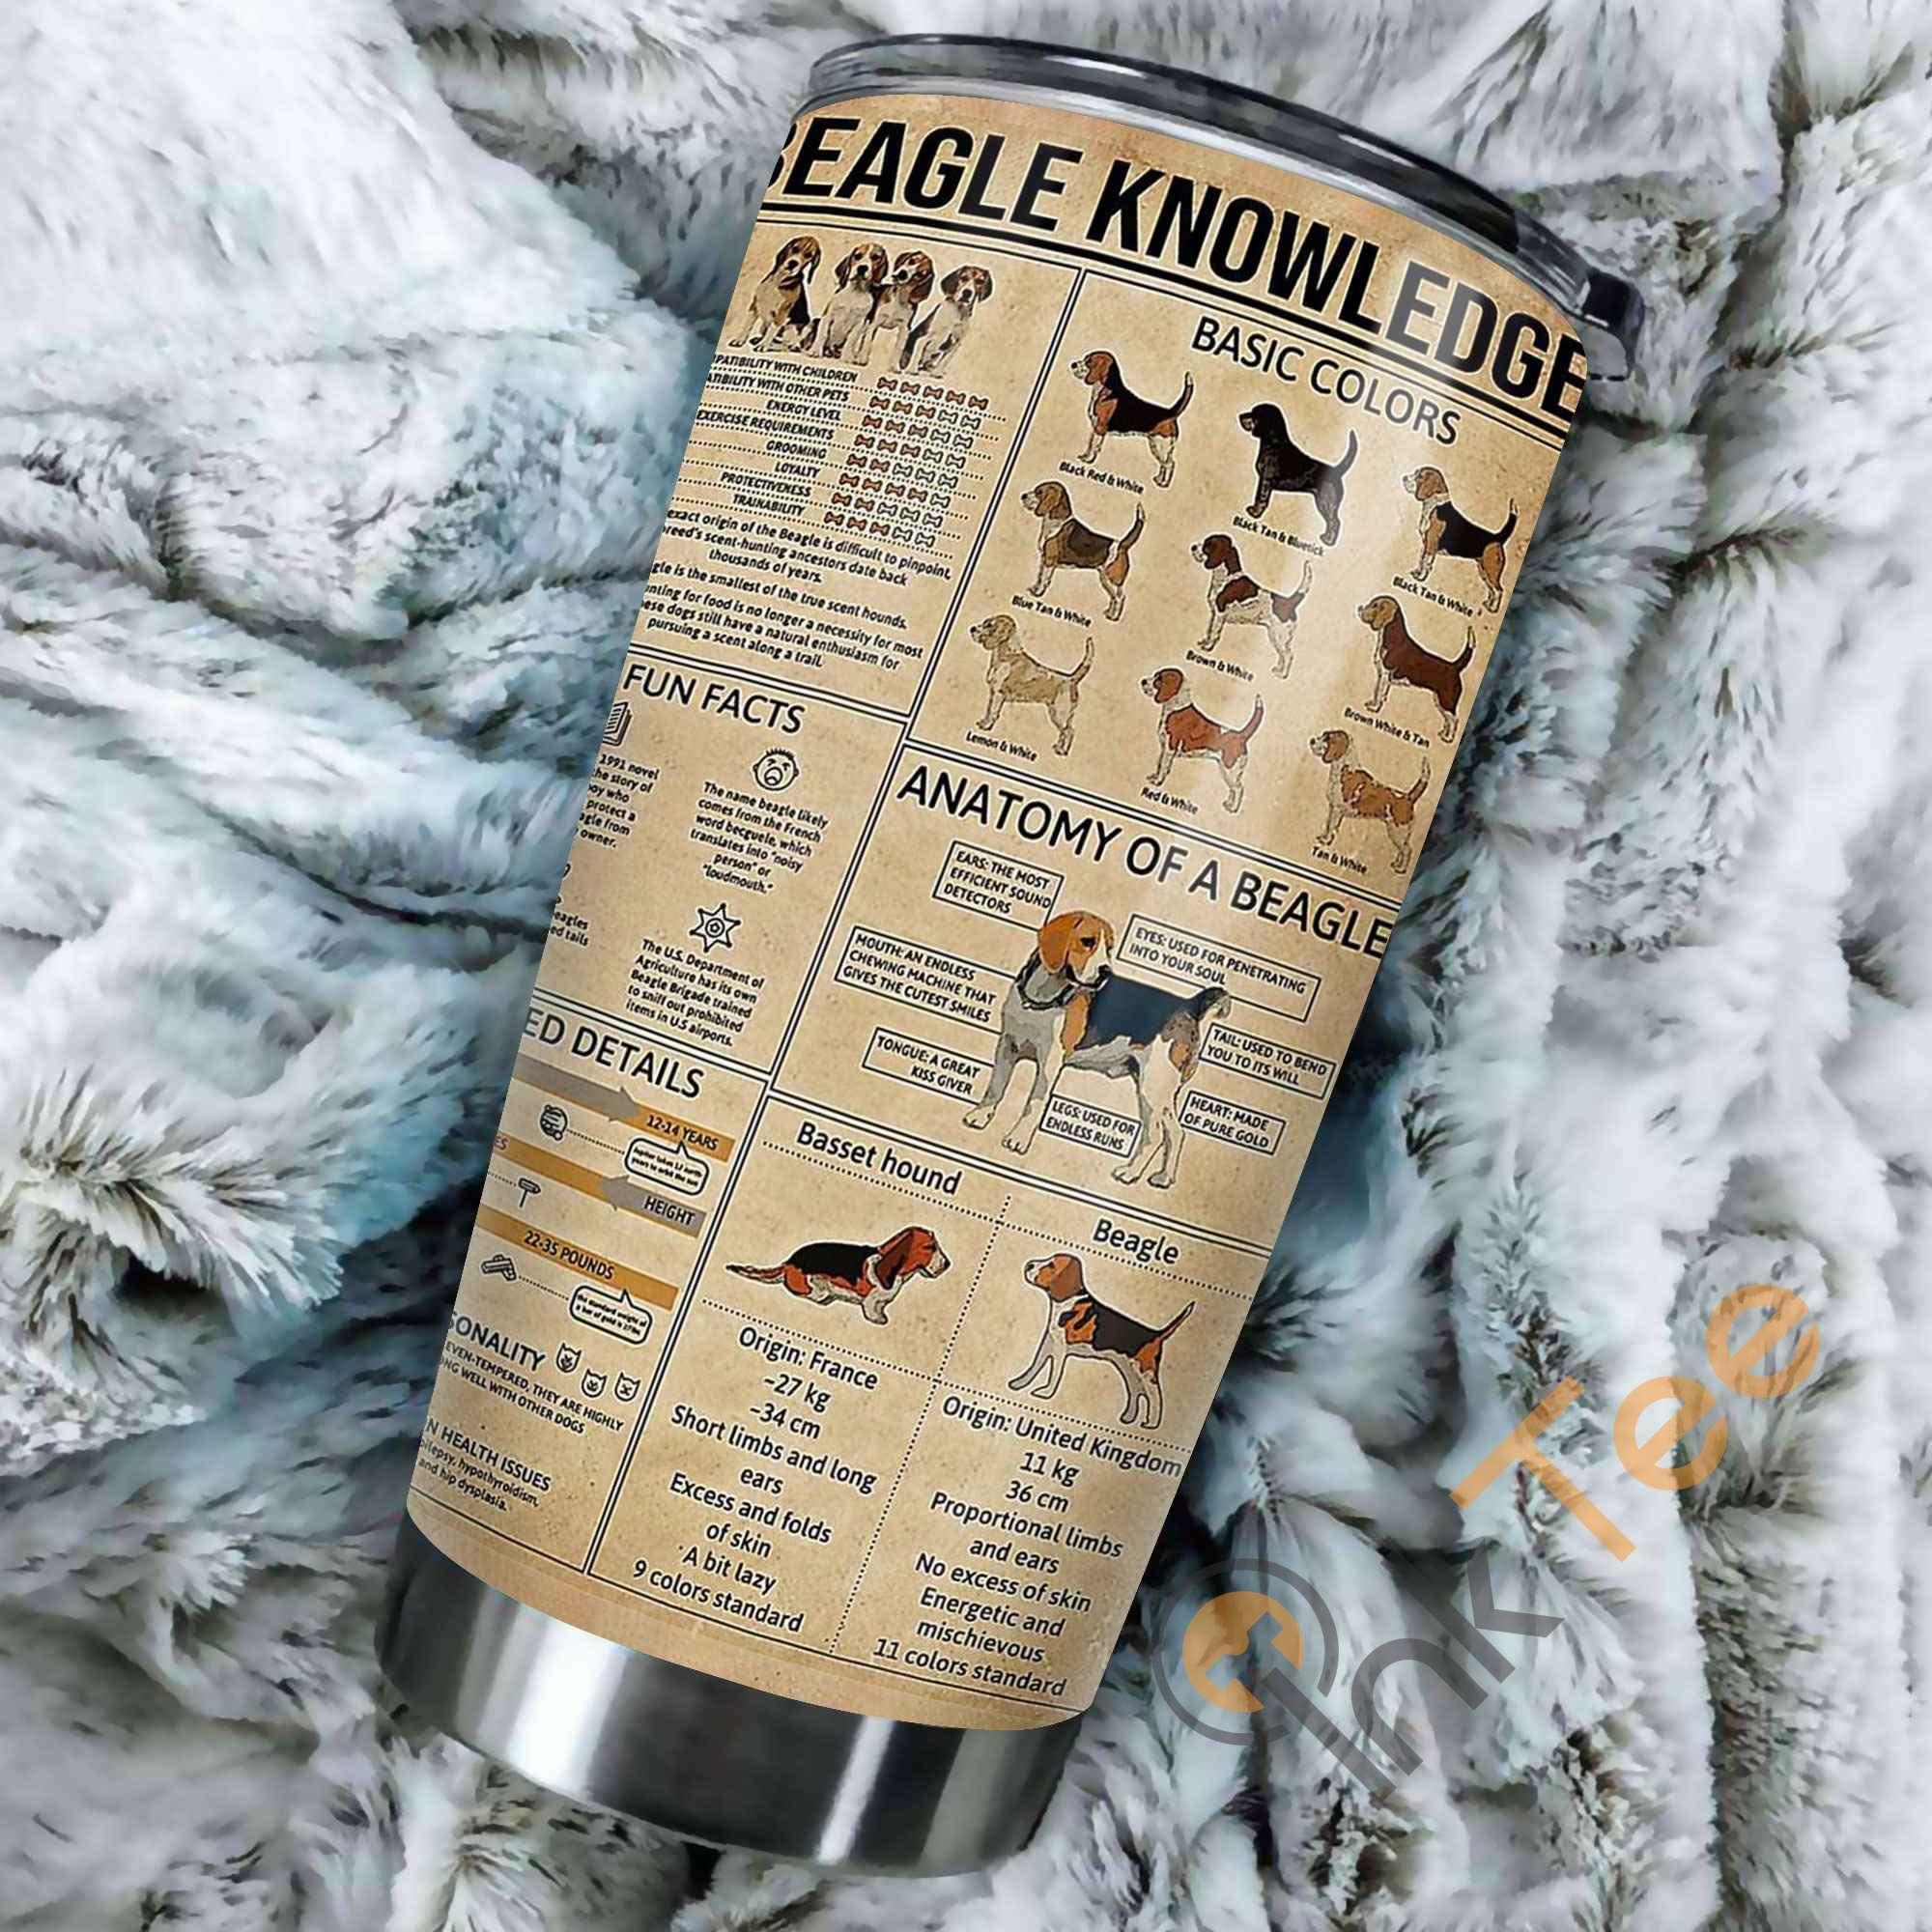 Beagle Knowledge Amazon Best Seller Sku 2639 Stainless Steel Tumbler